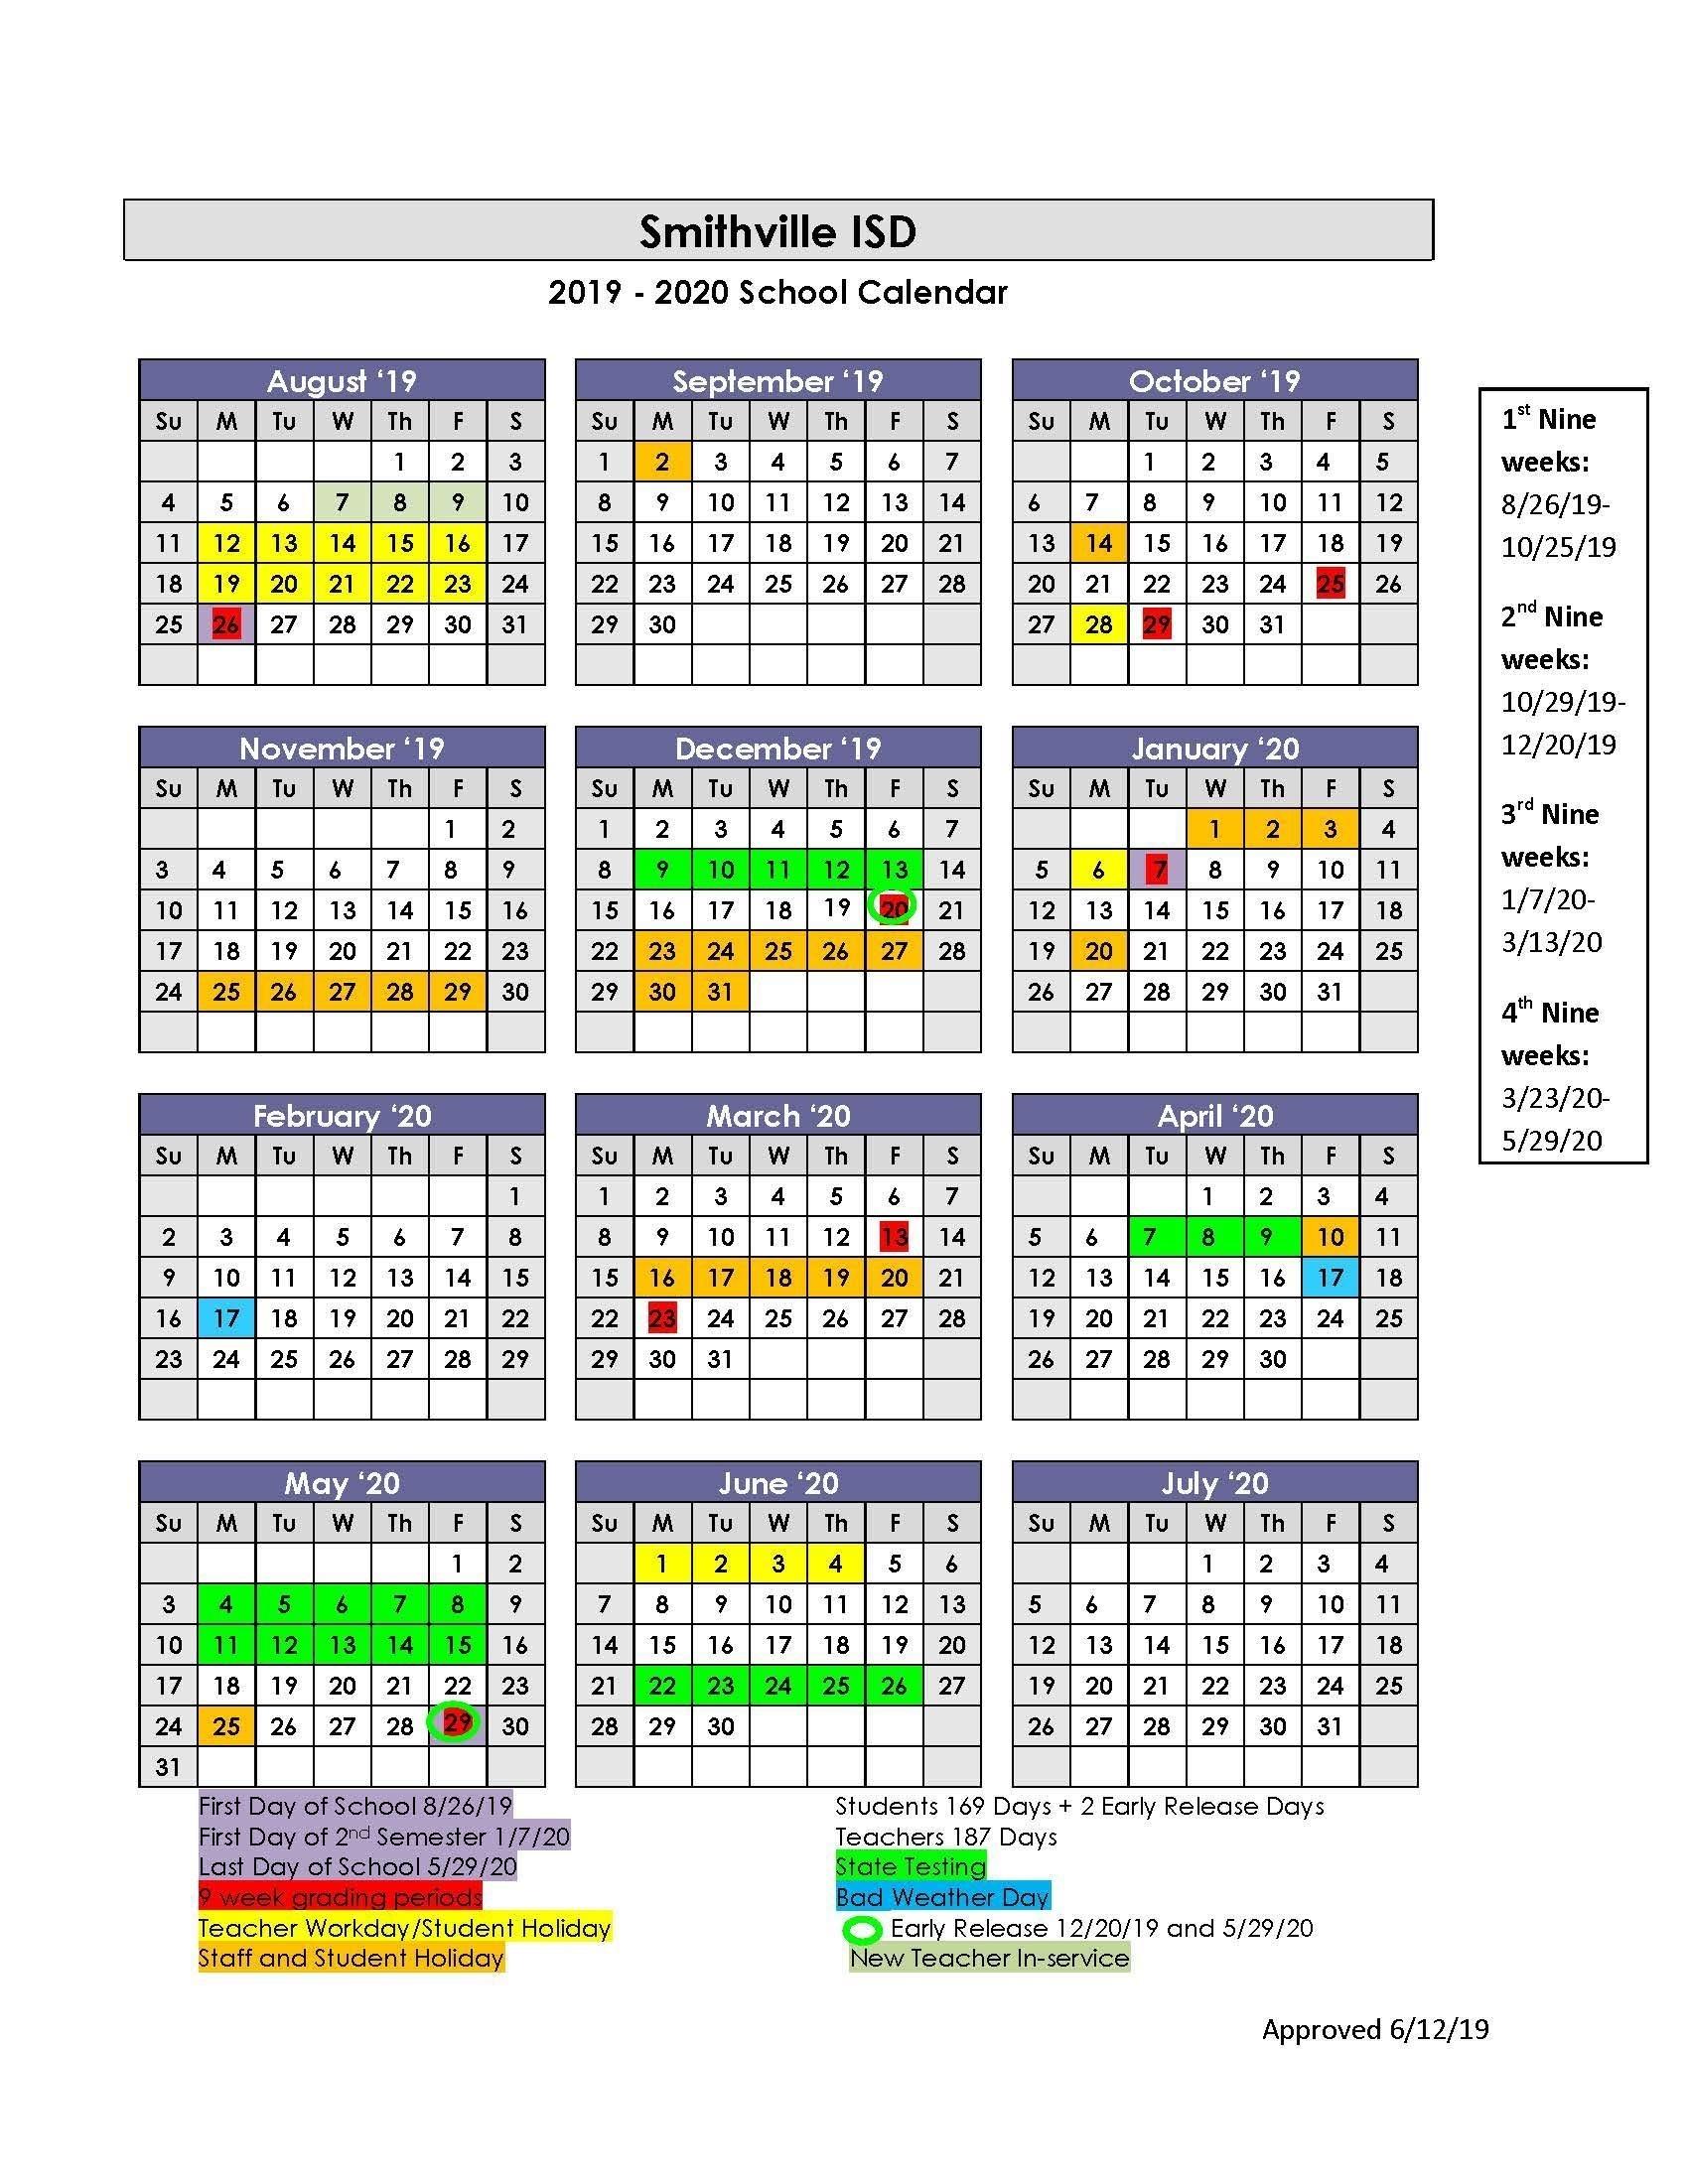 Sisd Academic Calendar – School Board – Smithville Independent pertaining to 2019 2020 Box Calender